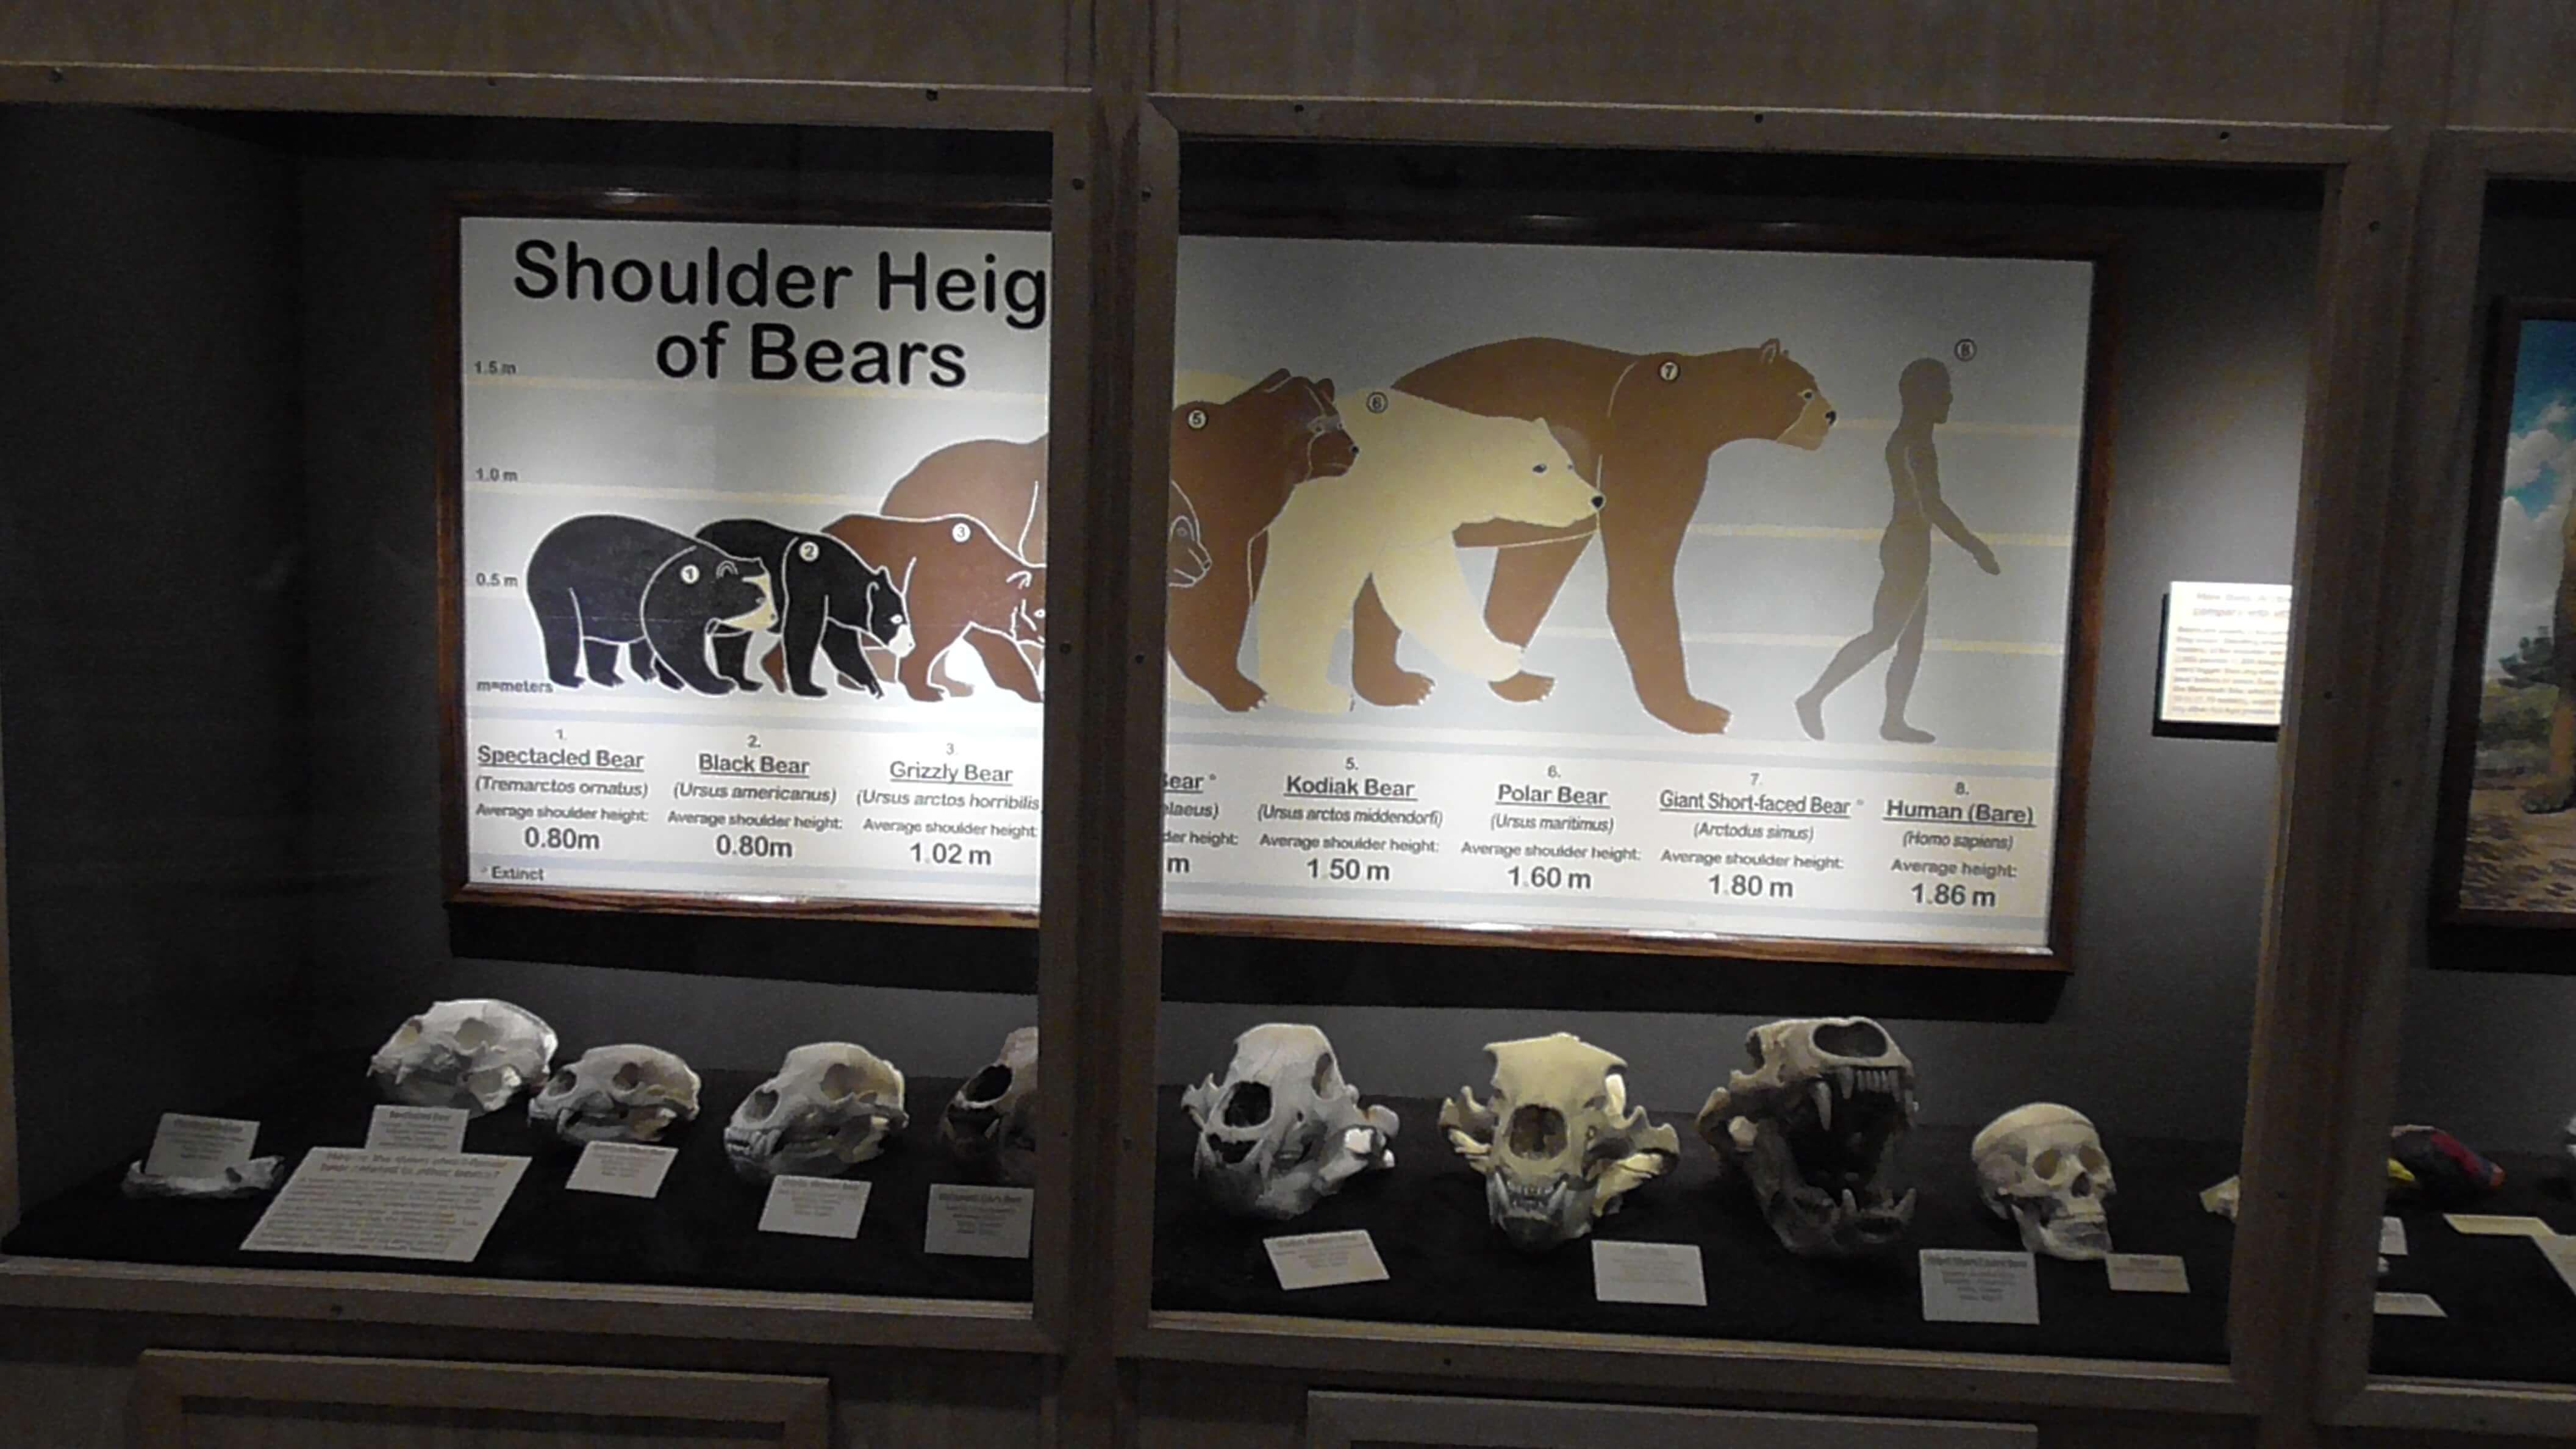 Comparison of Bear Sizes